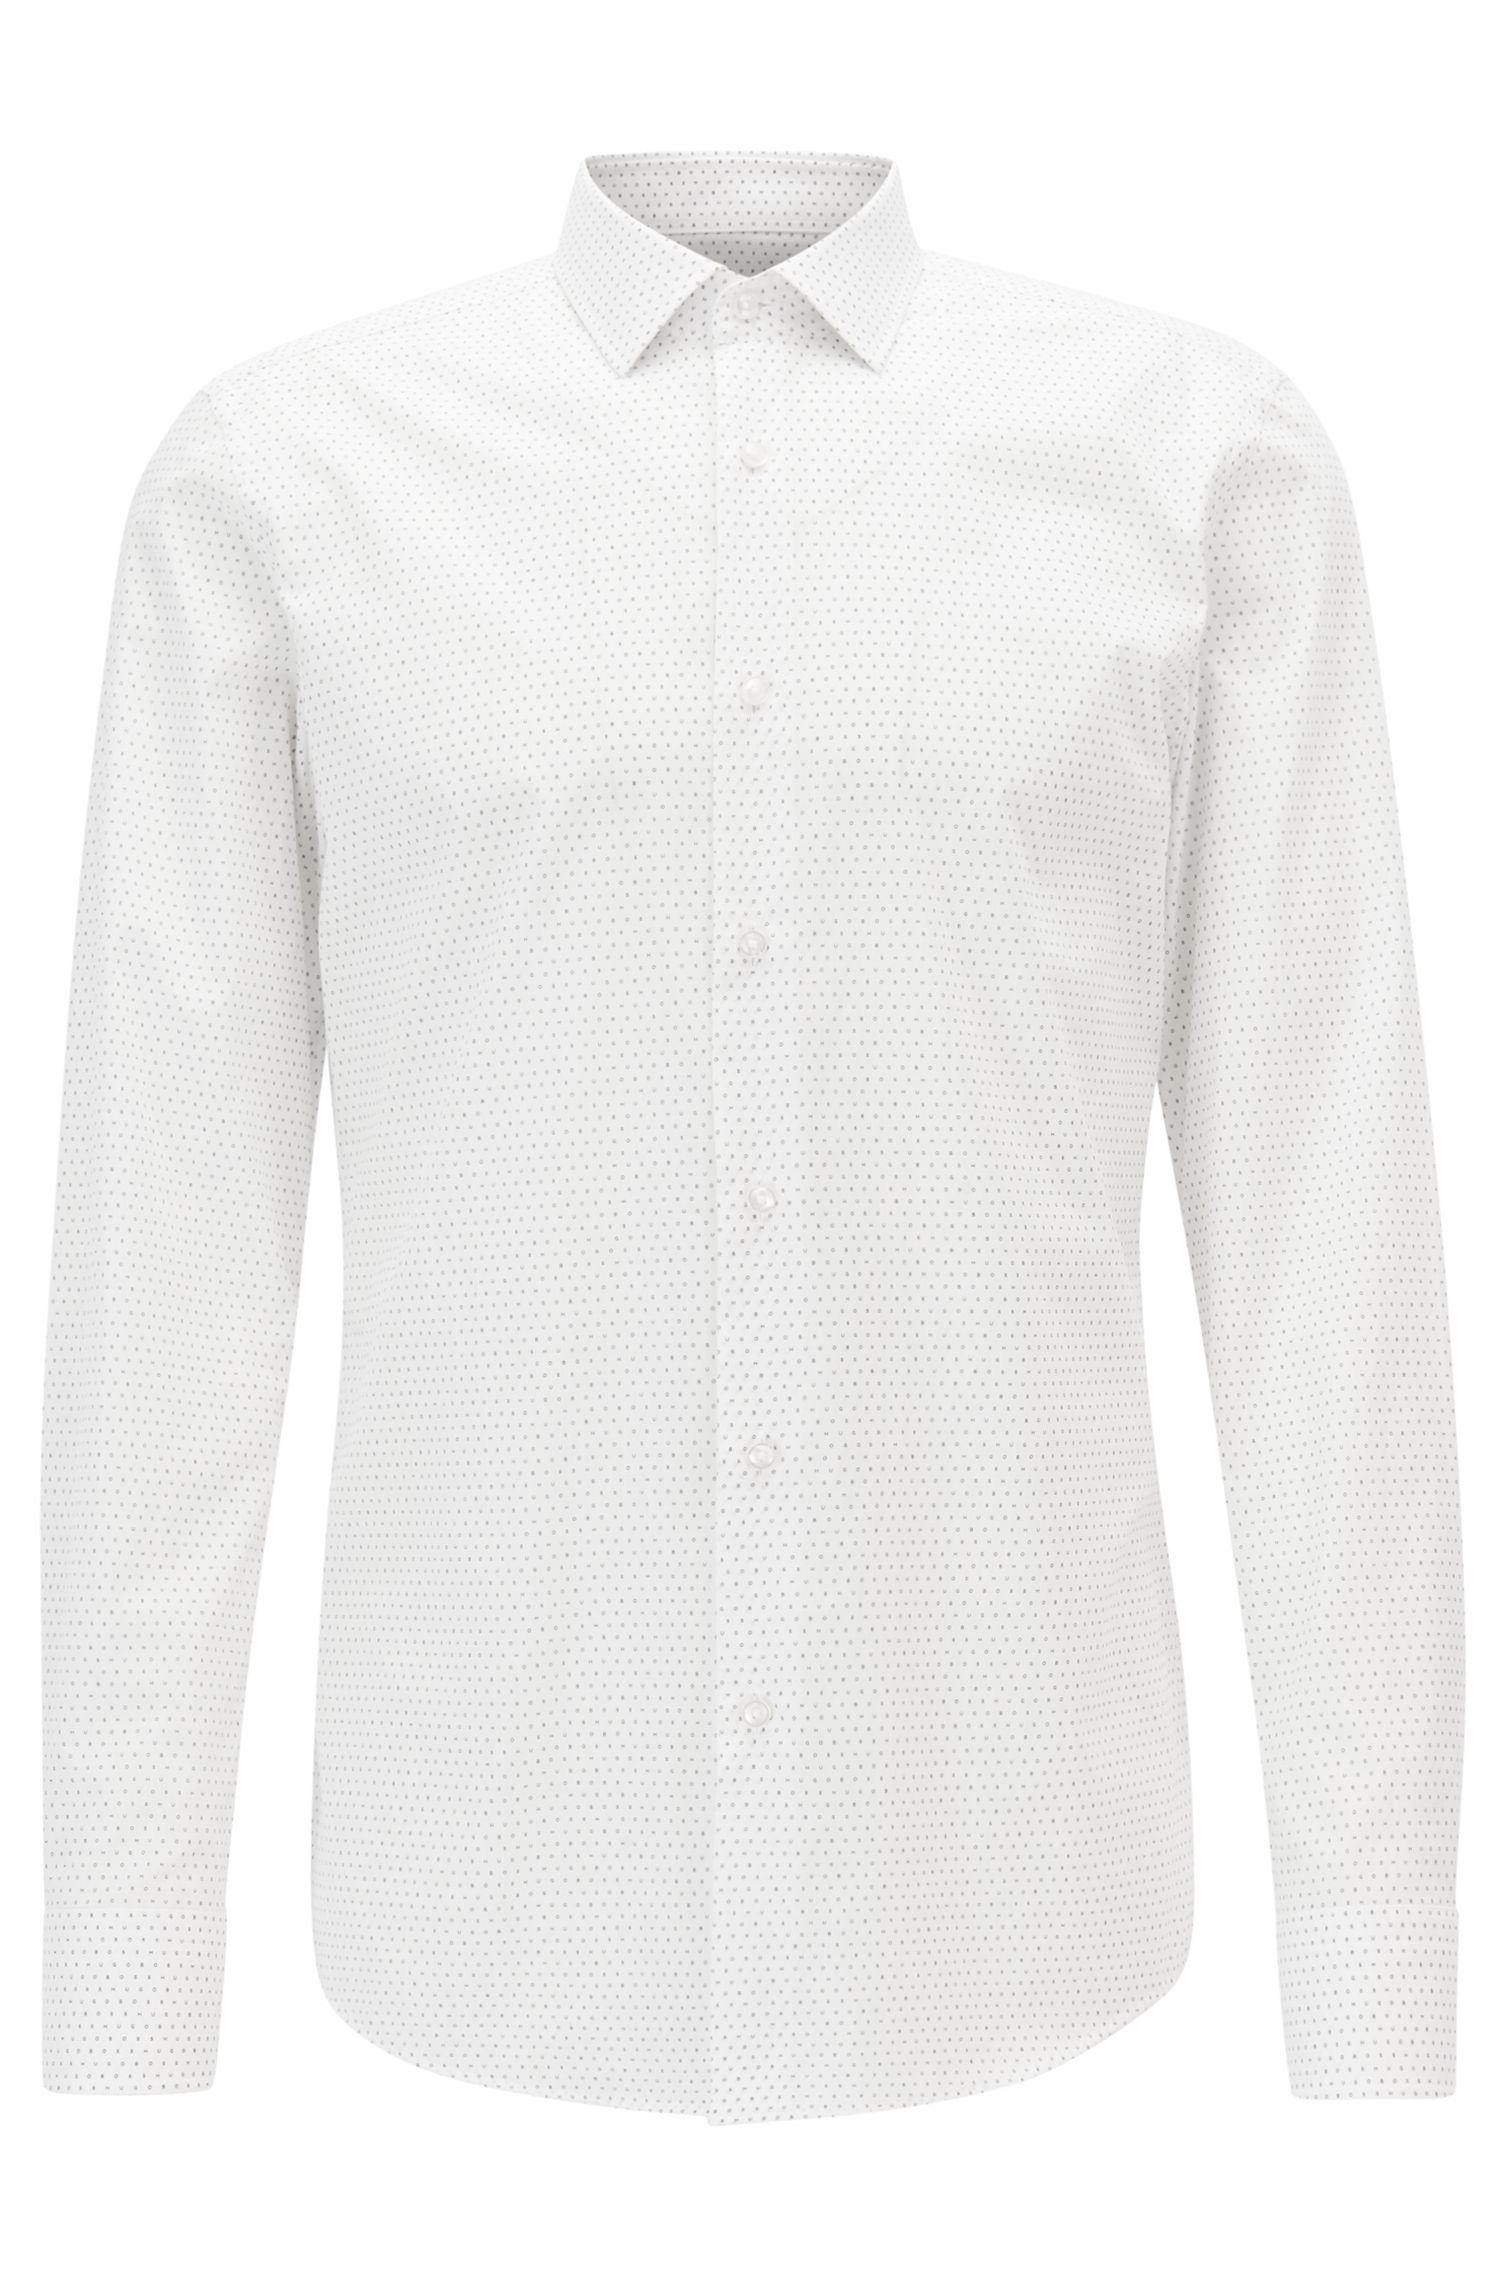 Bedrucktes Slim-Fit Hemd ausBaumwoll-Musselin